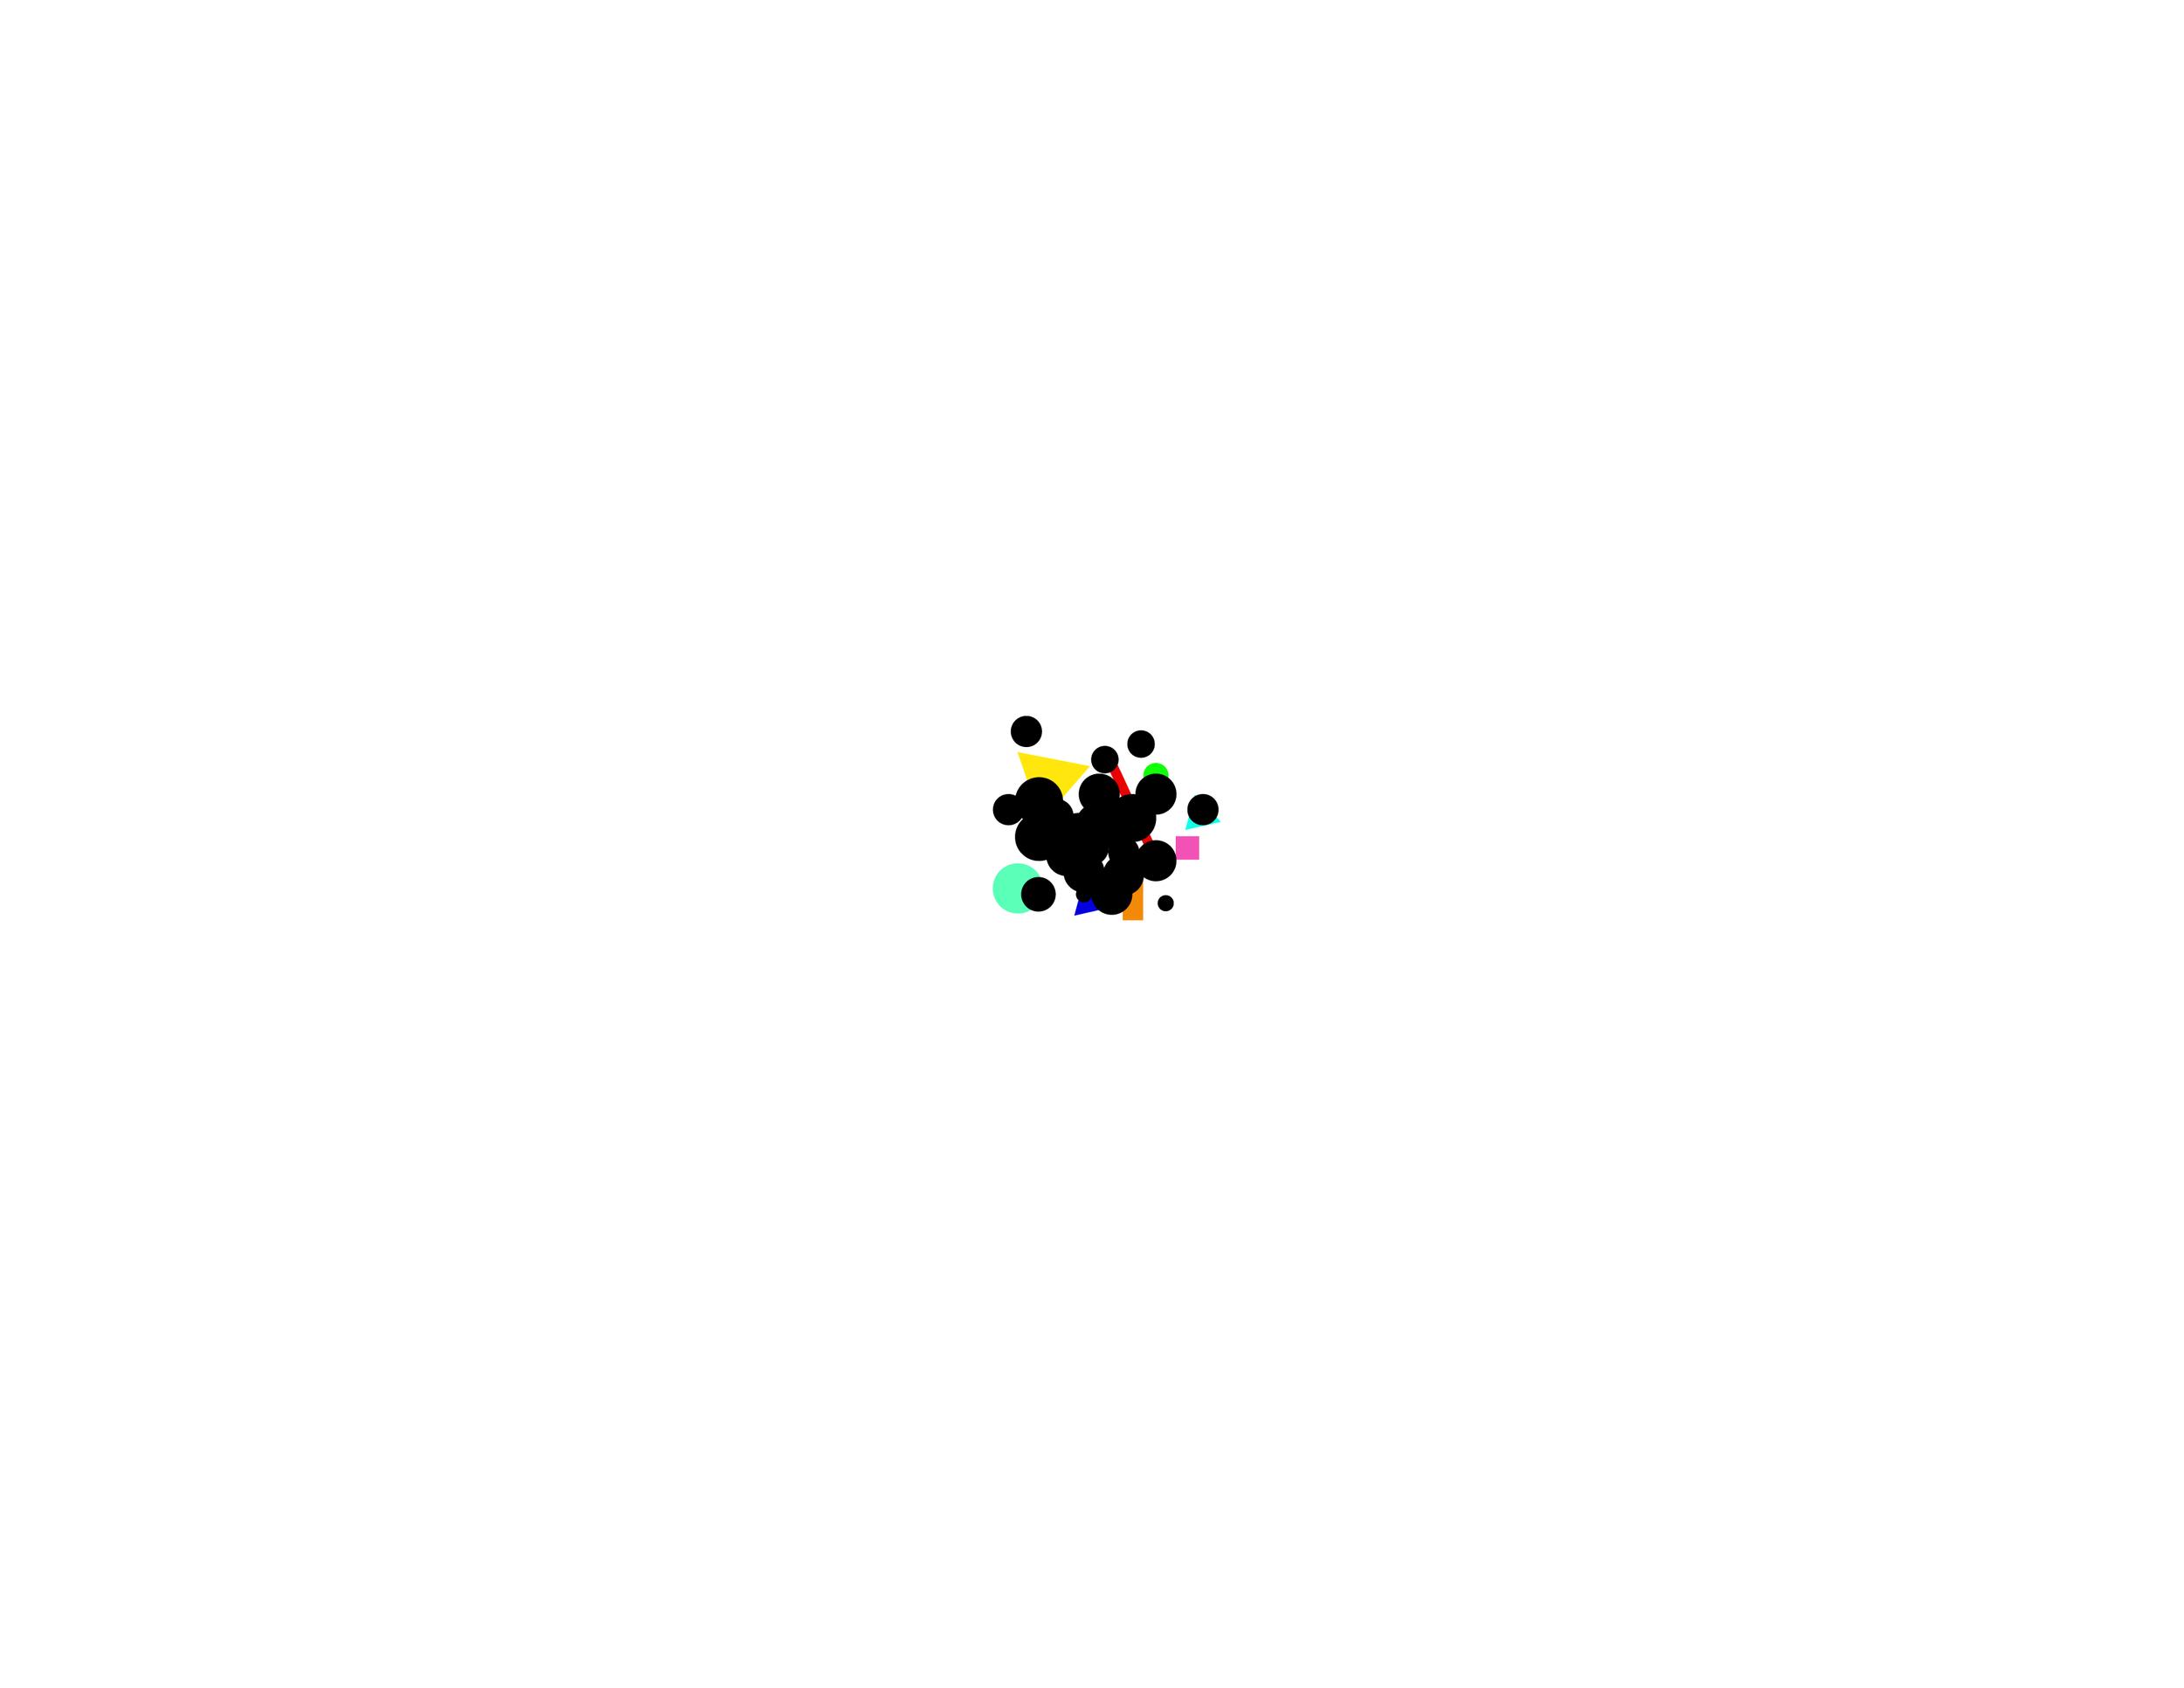 Keyframe-02.png